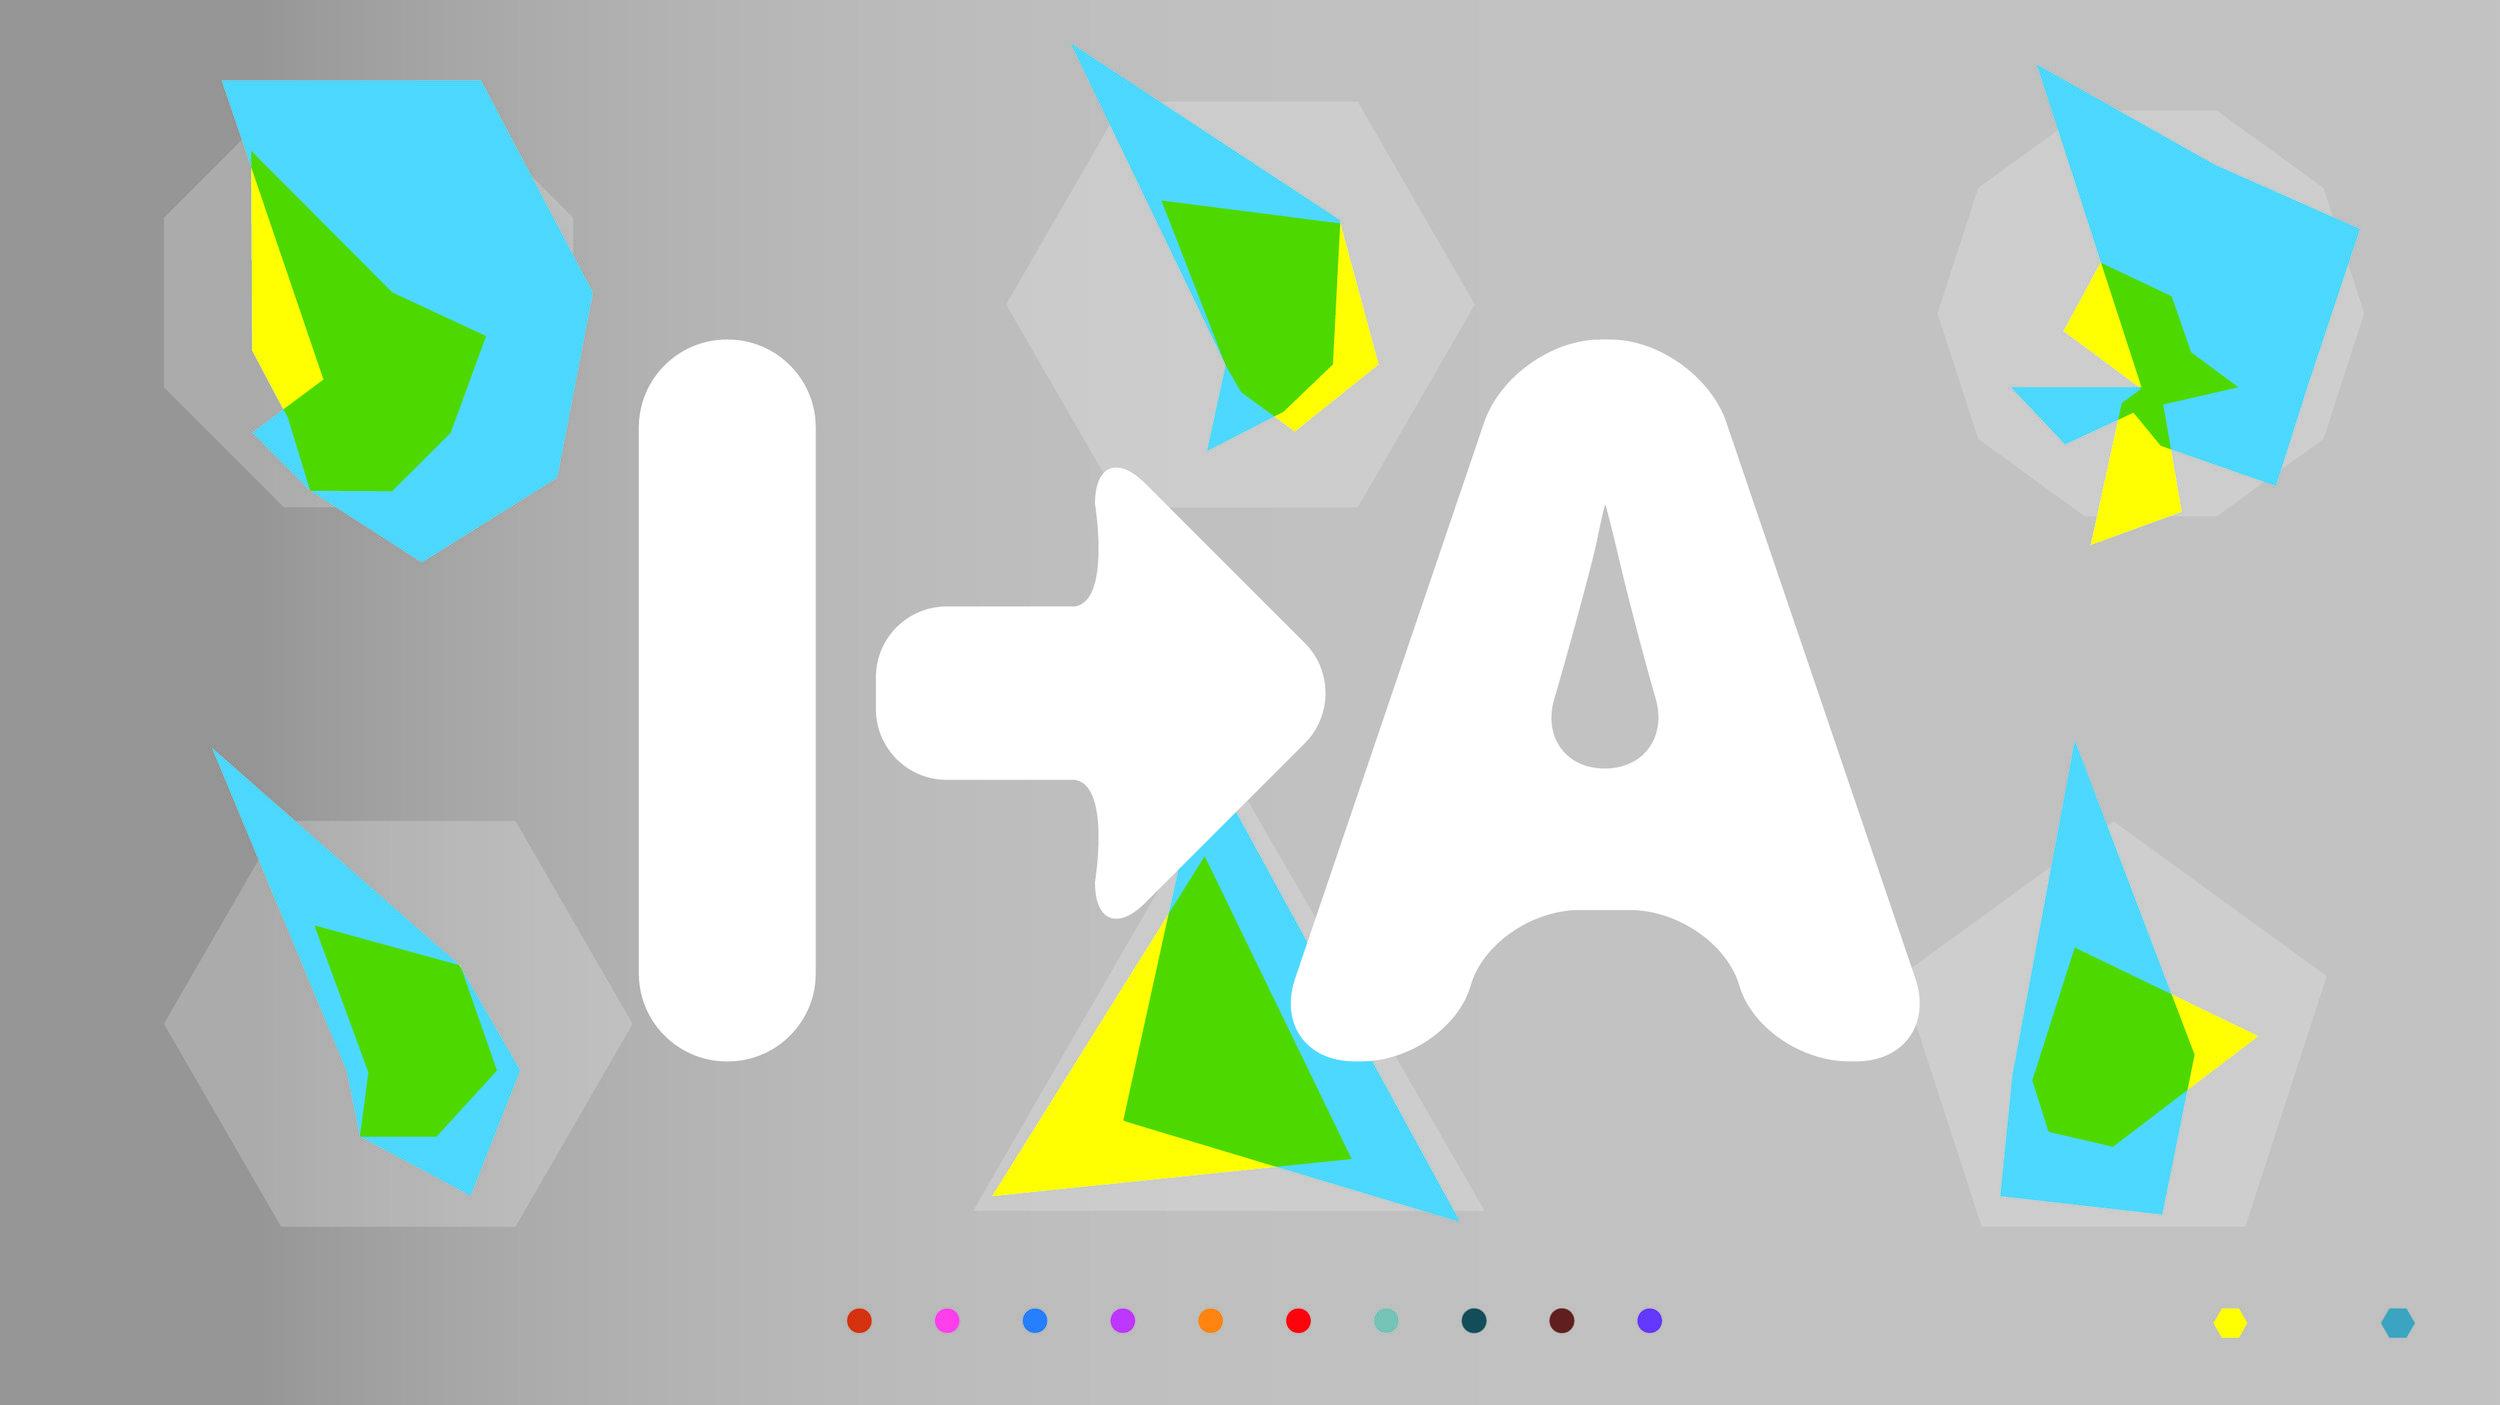 ItoA_image-01.jpg